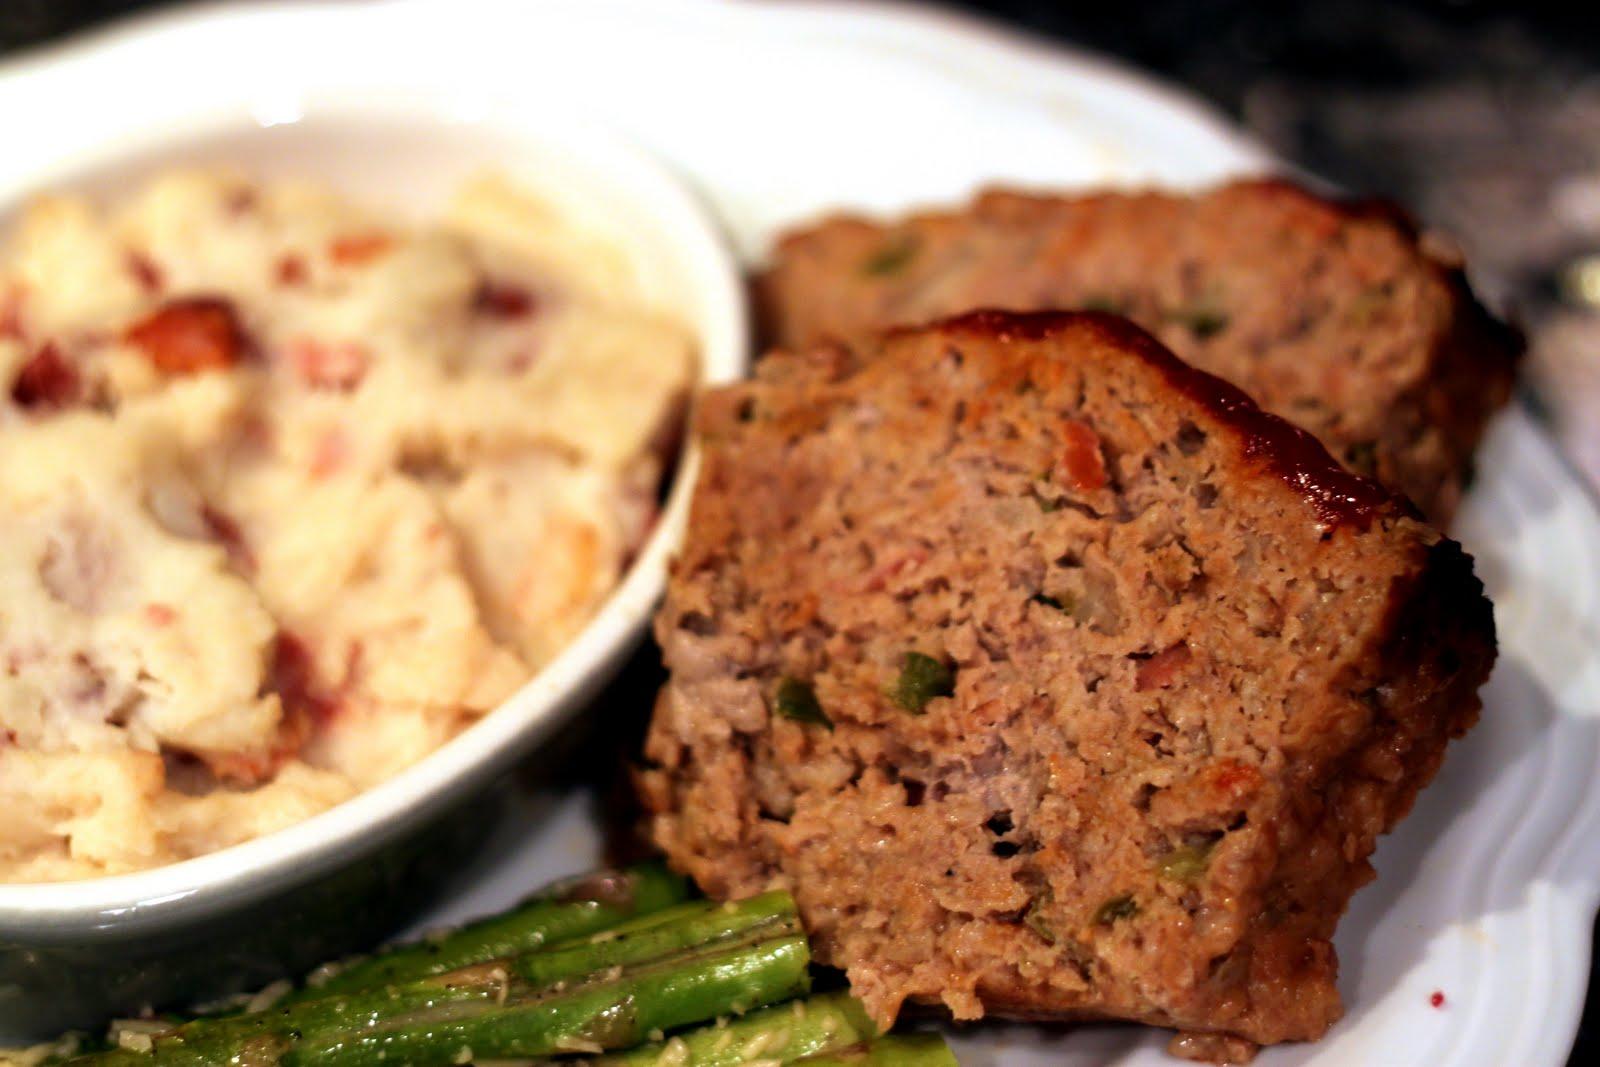 Pineapple Grass: Emeril's Turkey Meatloaf